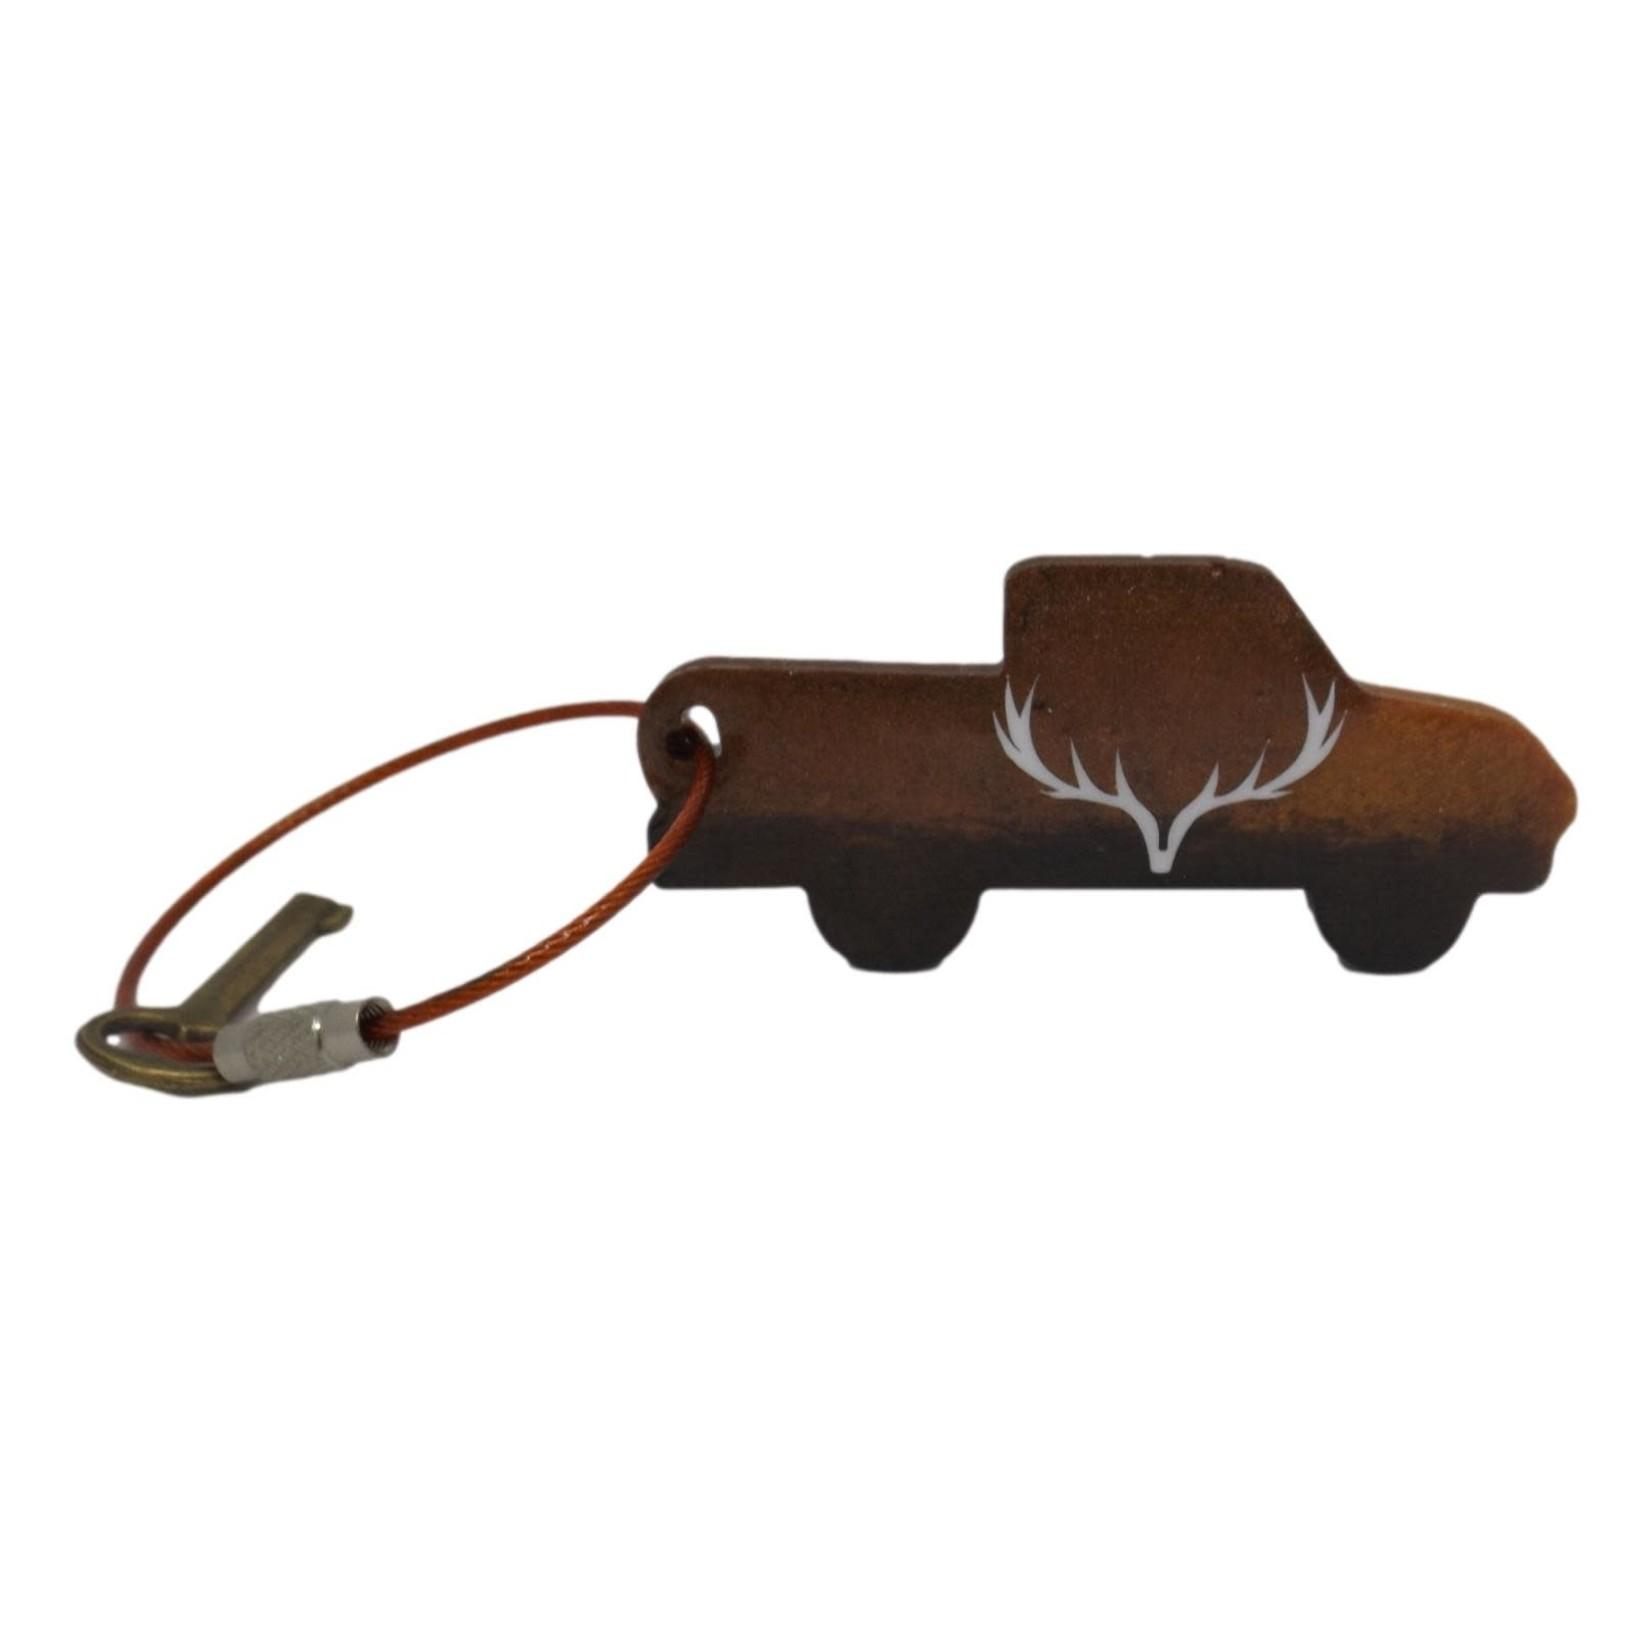 East Coast Sirens Antlers on a Truck Keychain